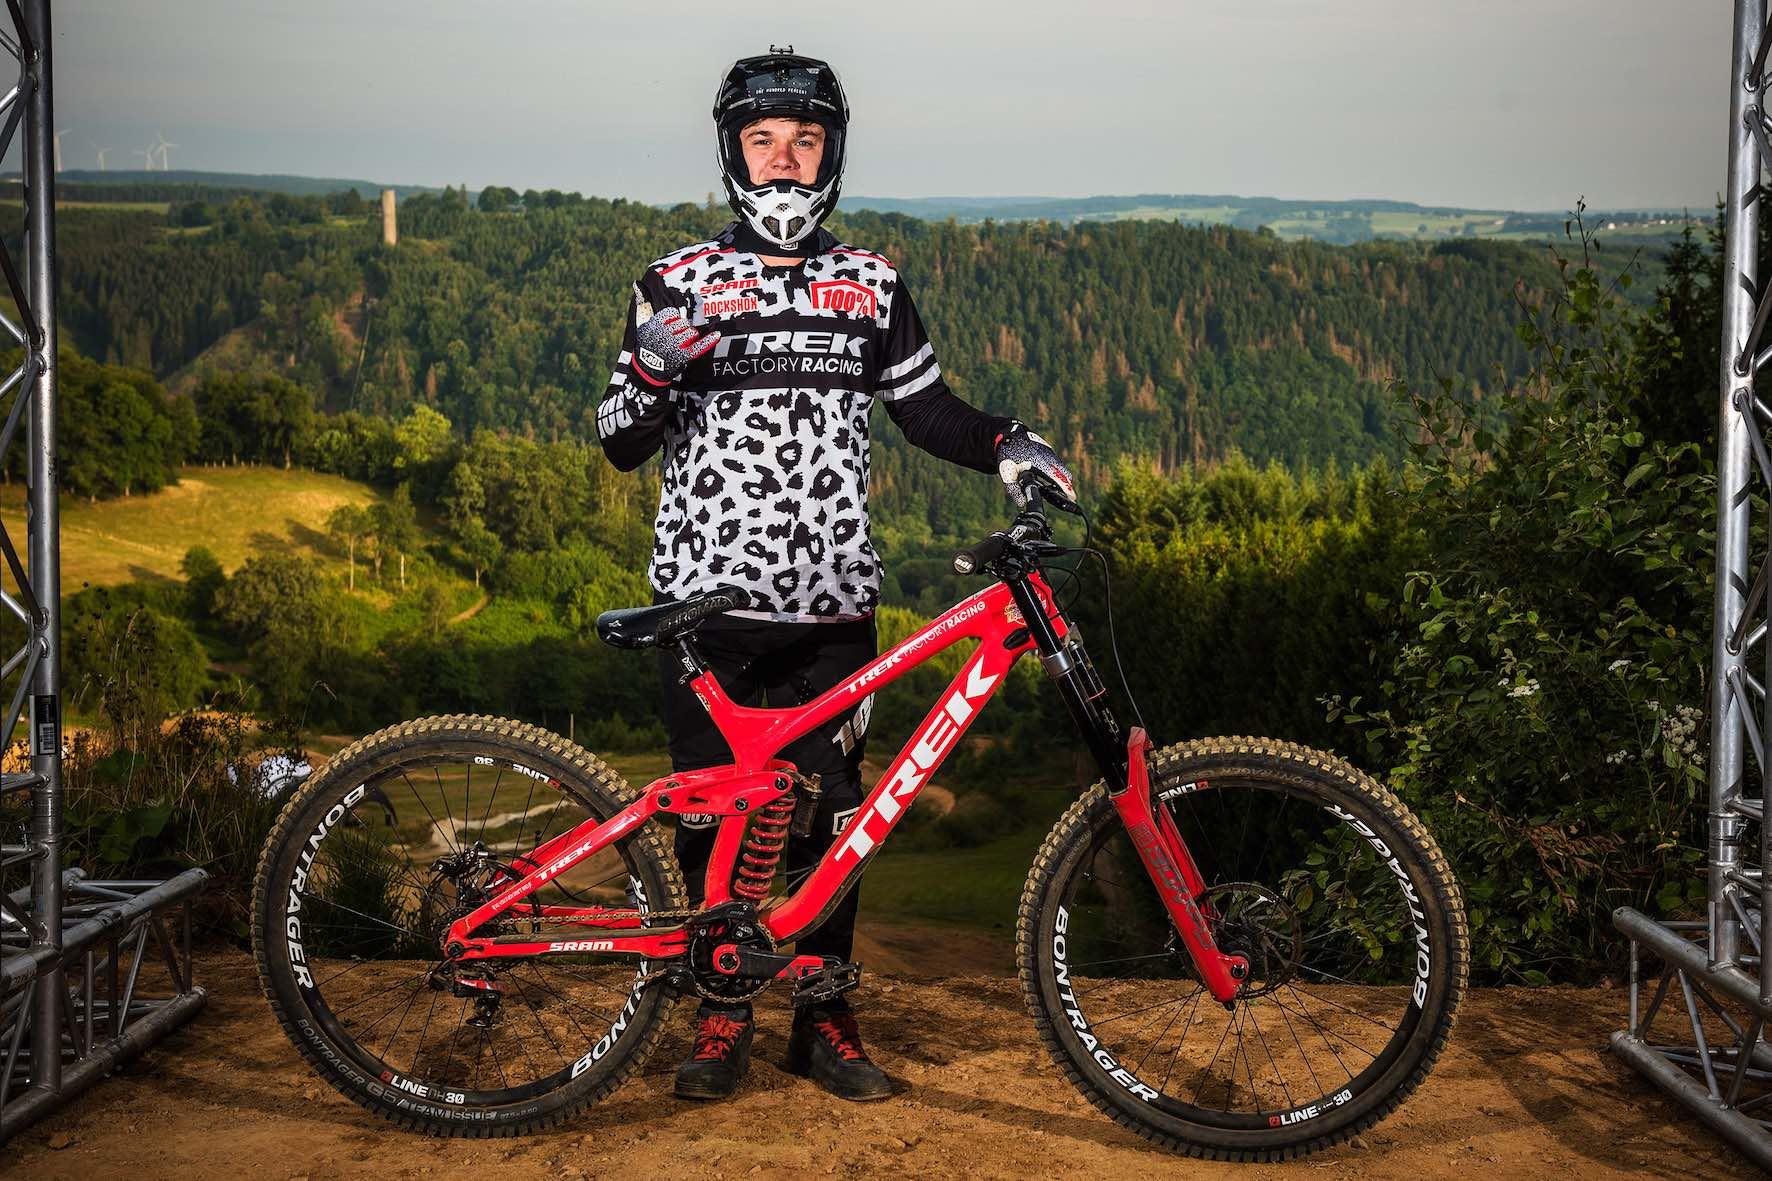 Bikes of Loosefest XL 2019 - Kade Edwards on Trek